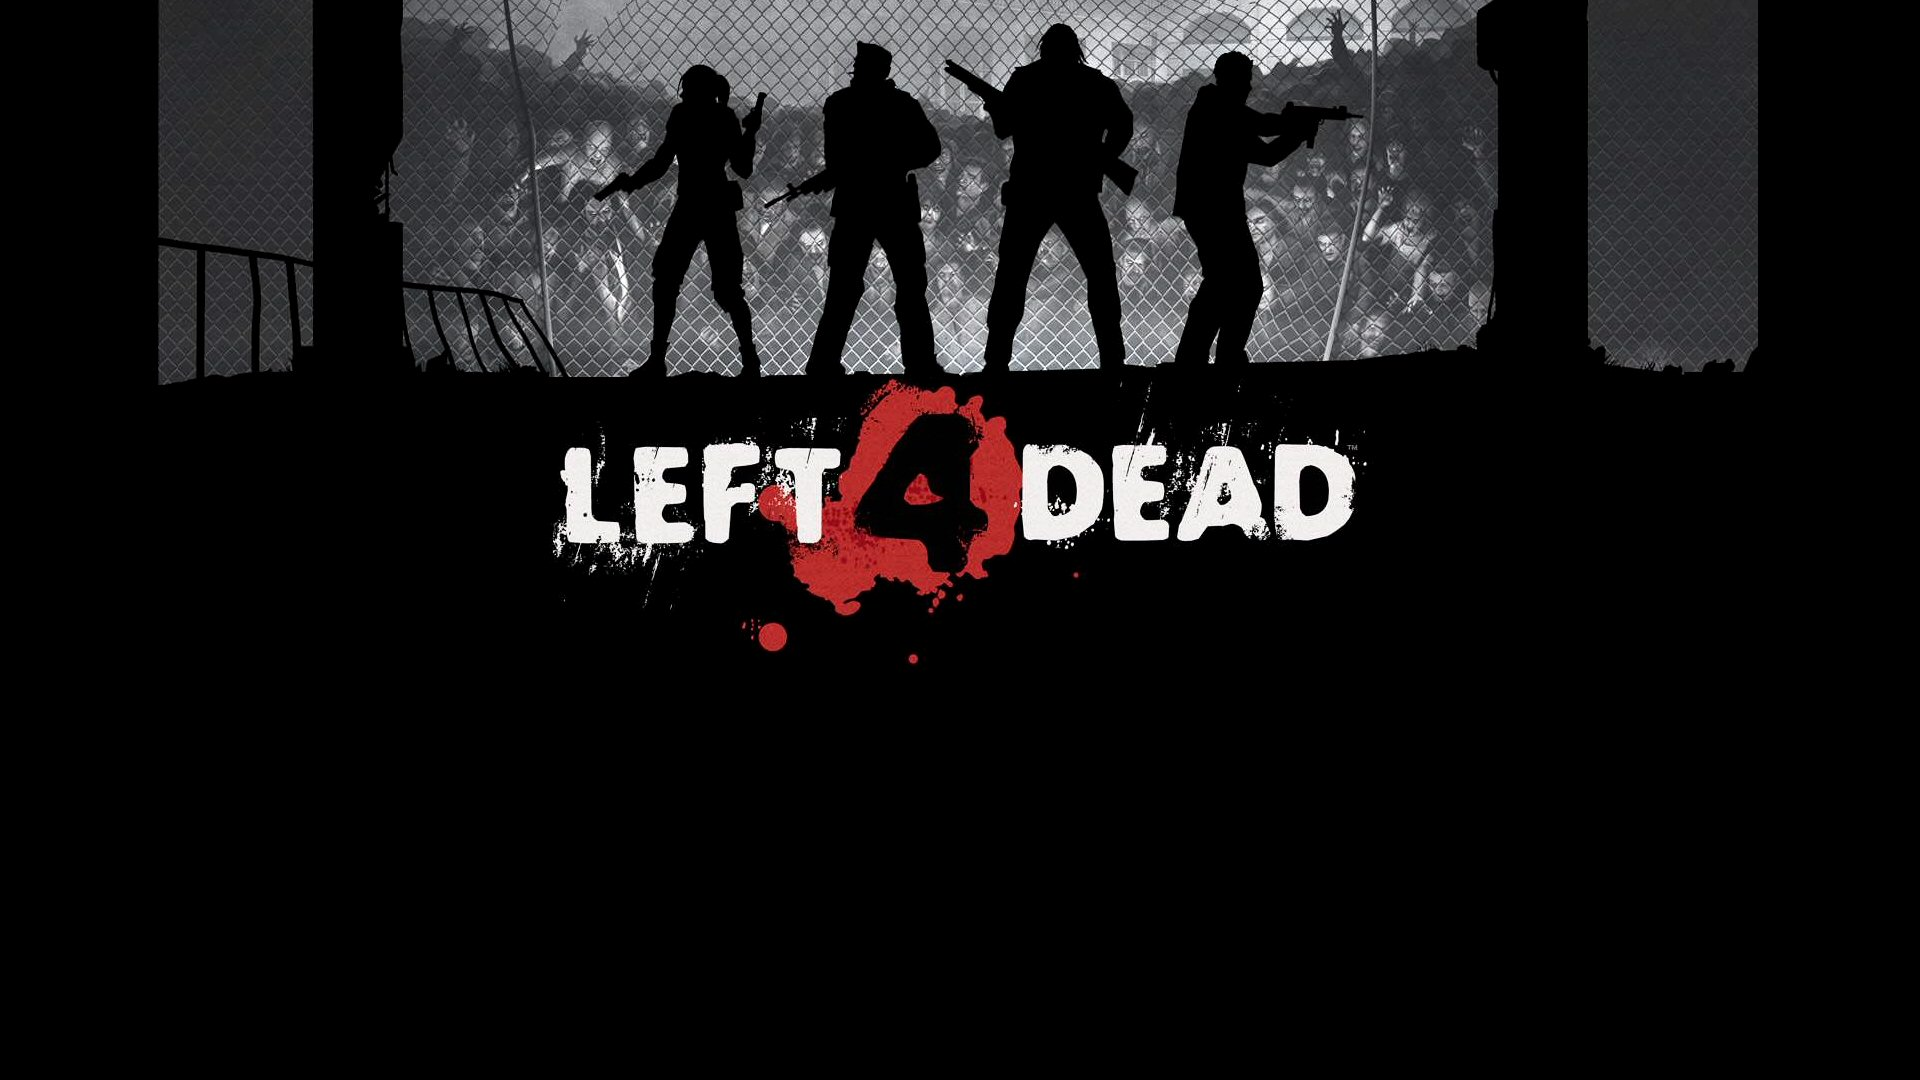 Left 4 Dead Wallpaper Free Download PC